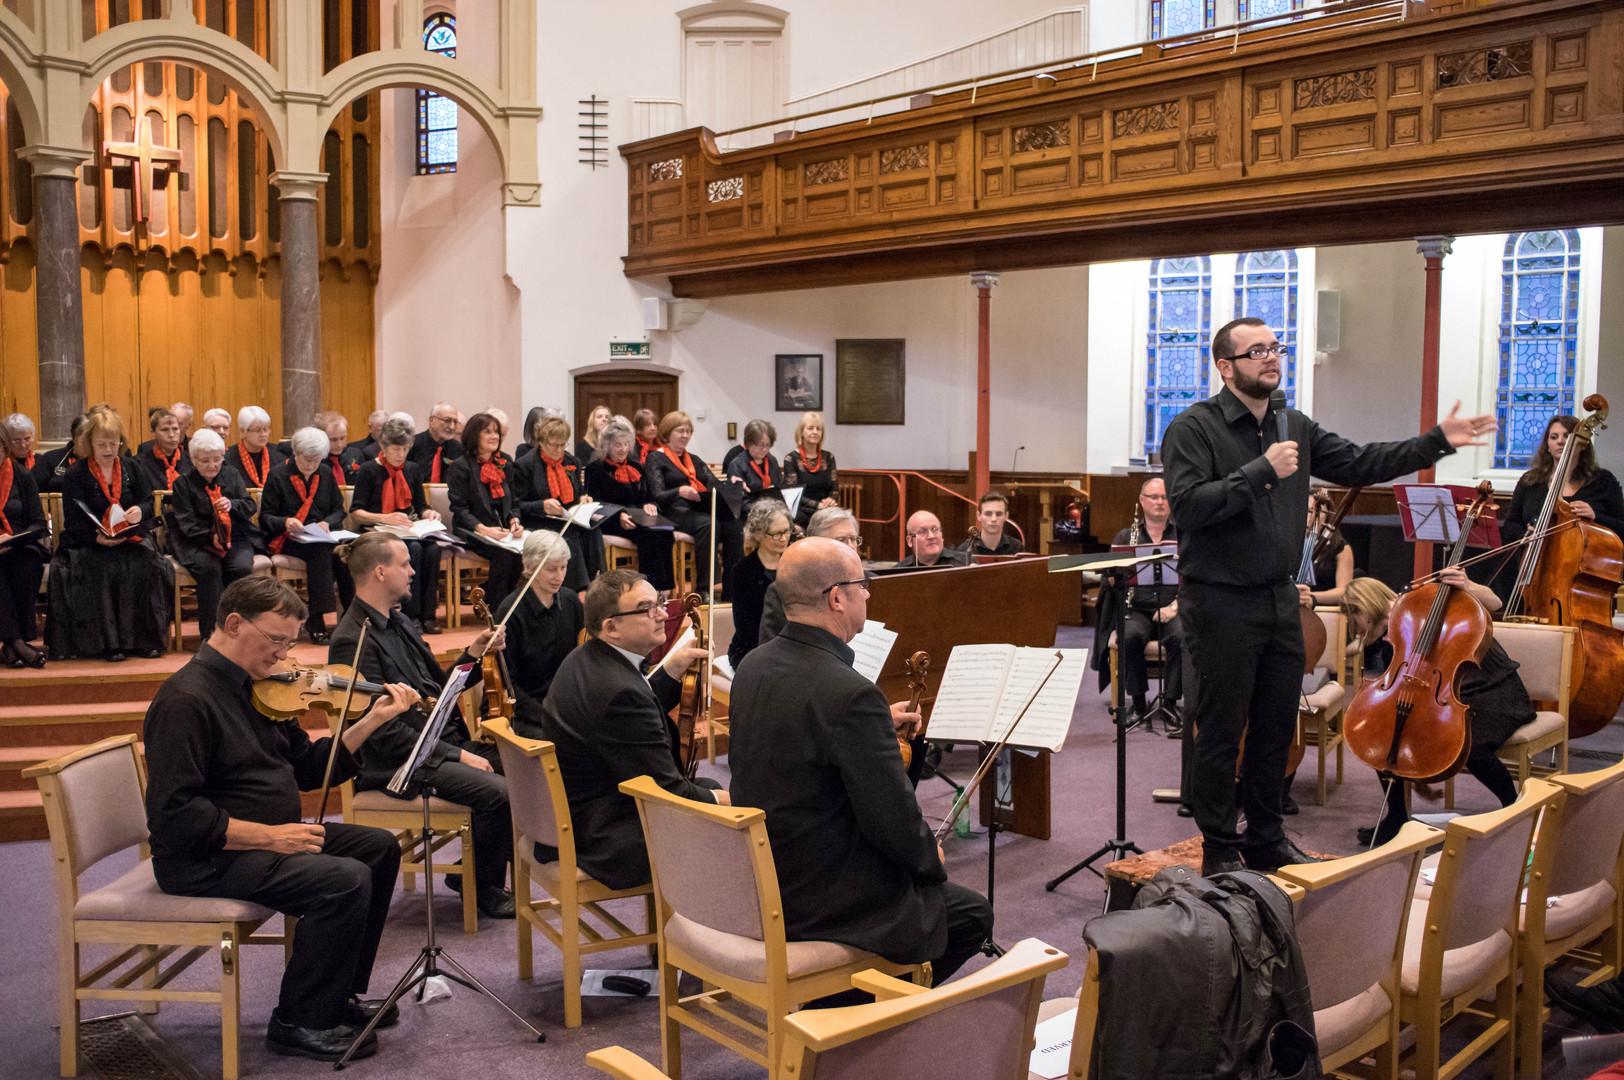 12 Nov 2016 - Exploring Handel at Warwick Rd URC, Coventry